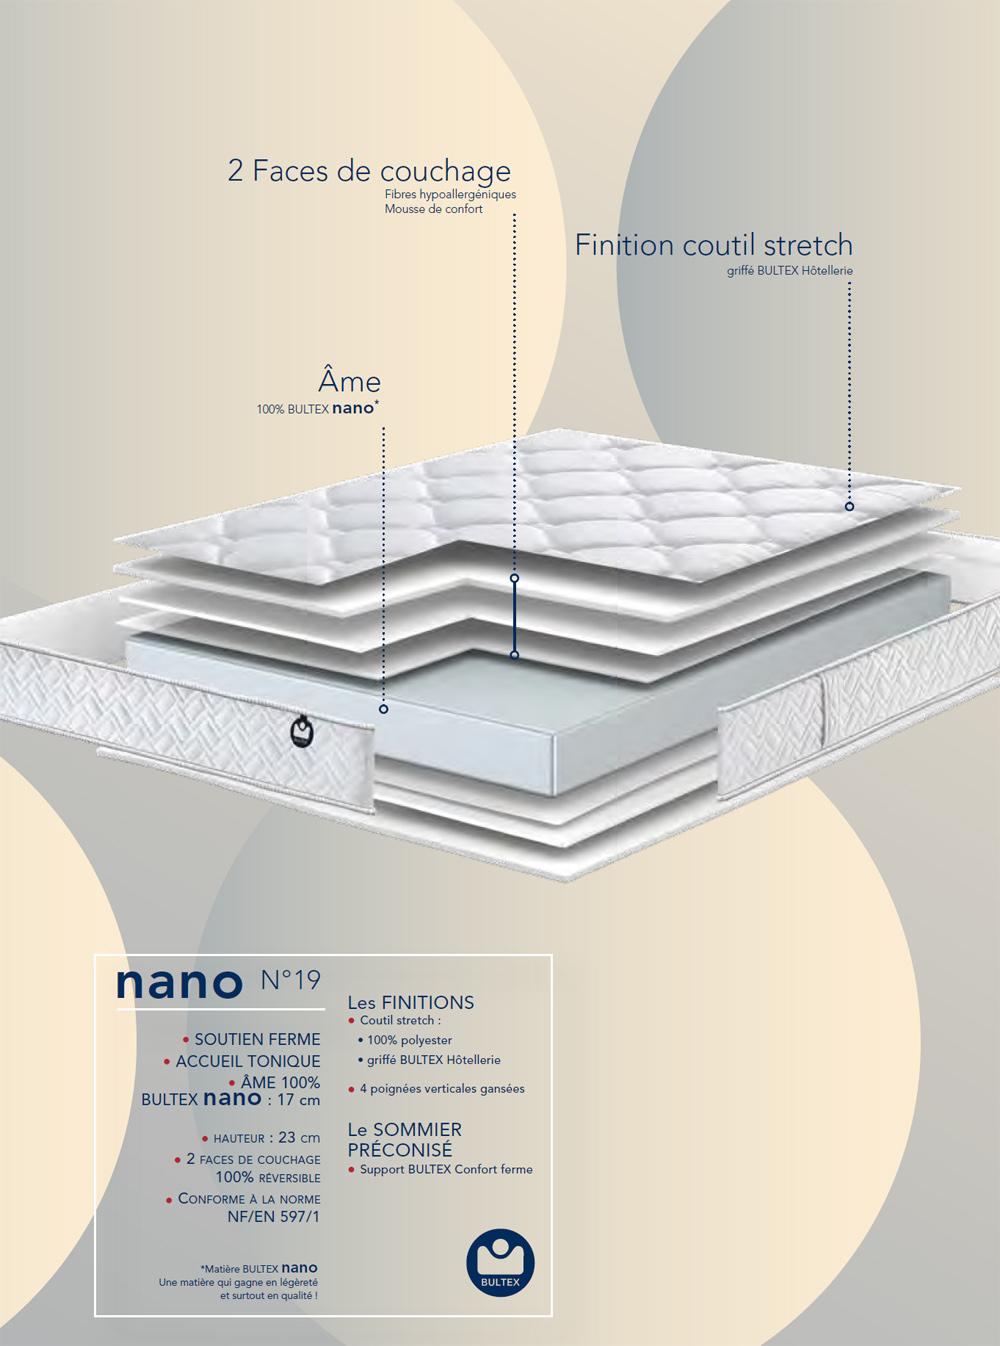 matelas bultex nano magasin de literie jirdeco la londe. Black Bedroom Furniture Sets. Home Design Ideas